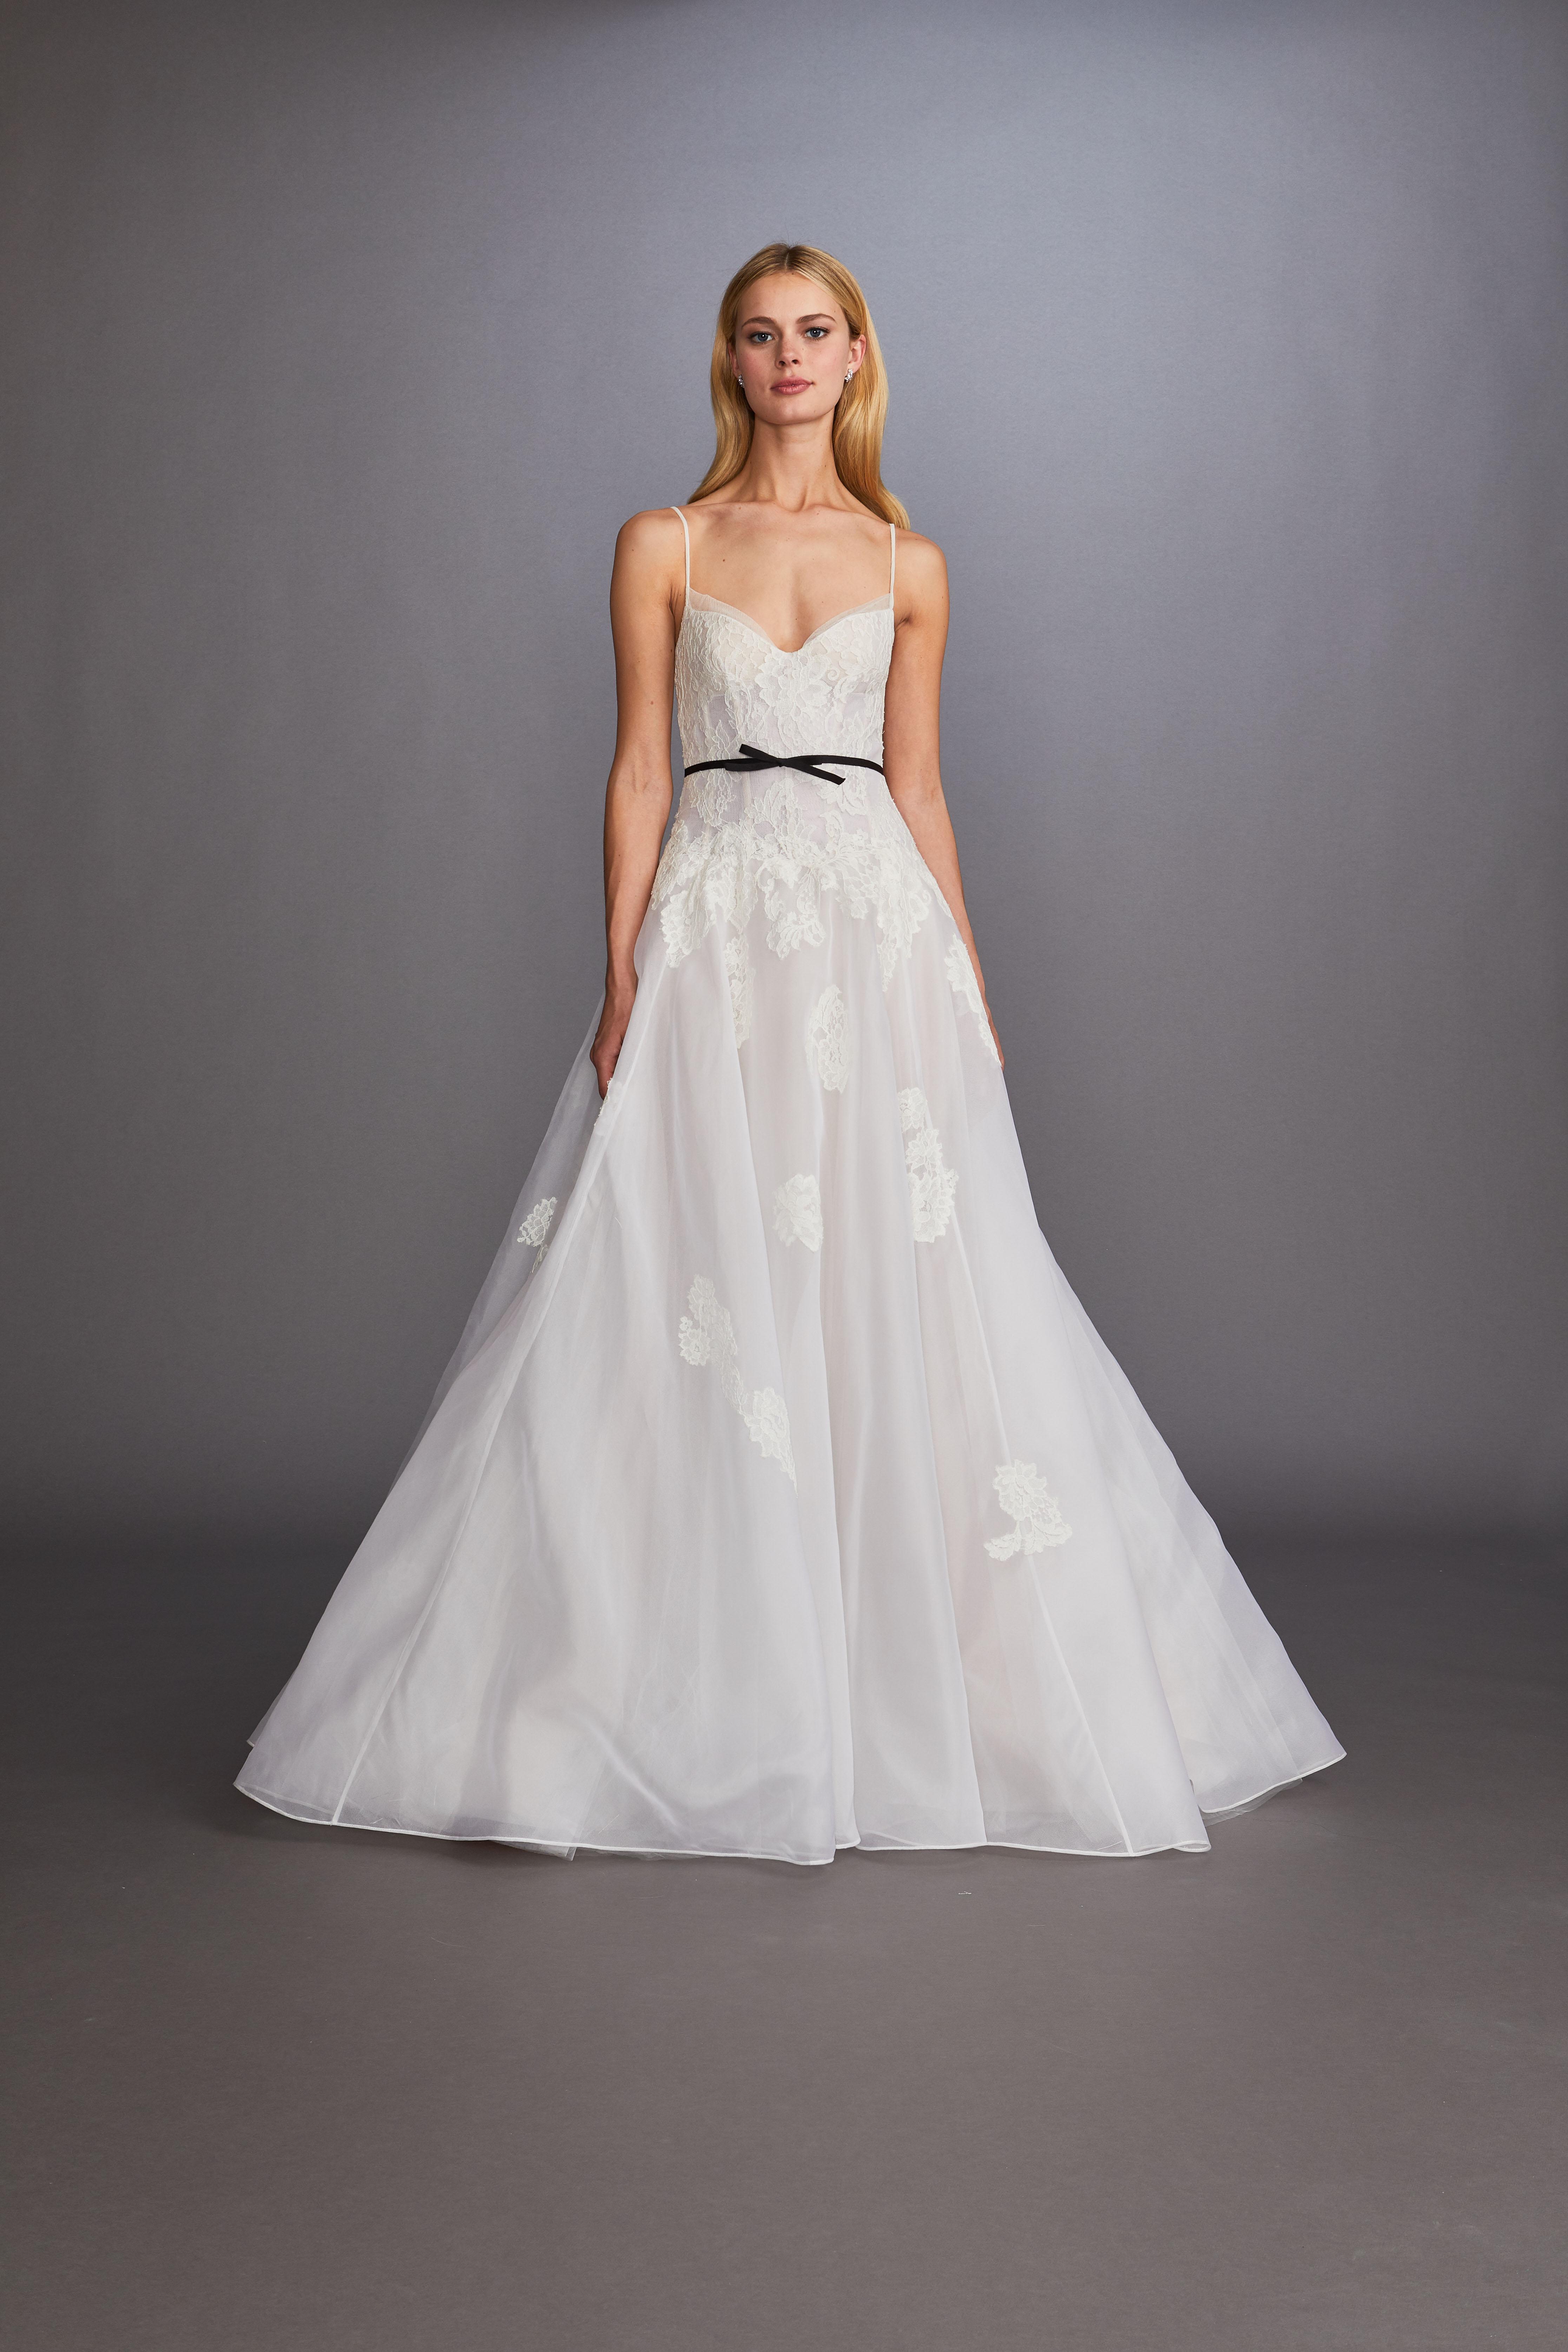 spaghetti strap sweetheart neckline lace tulle black belt a-line wedding dress Allison Webb Spring 2020